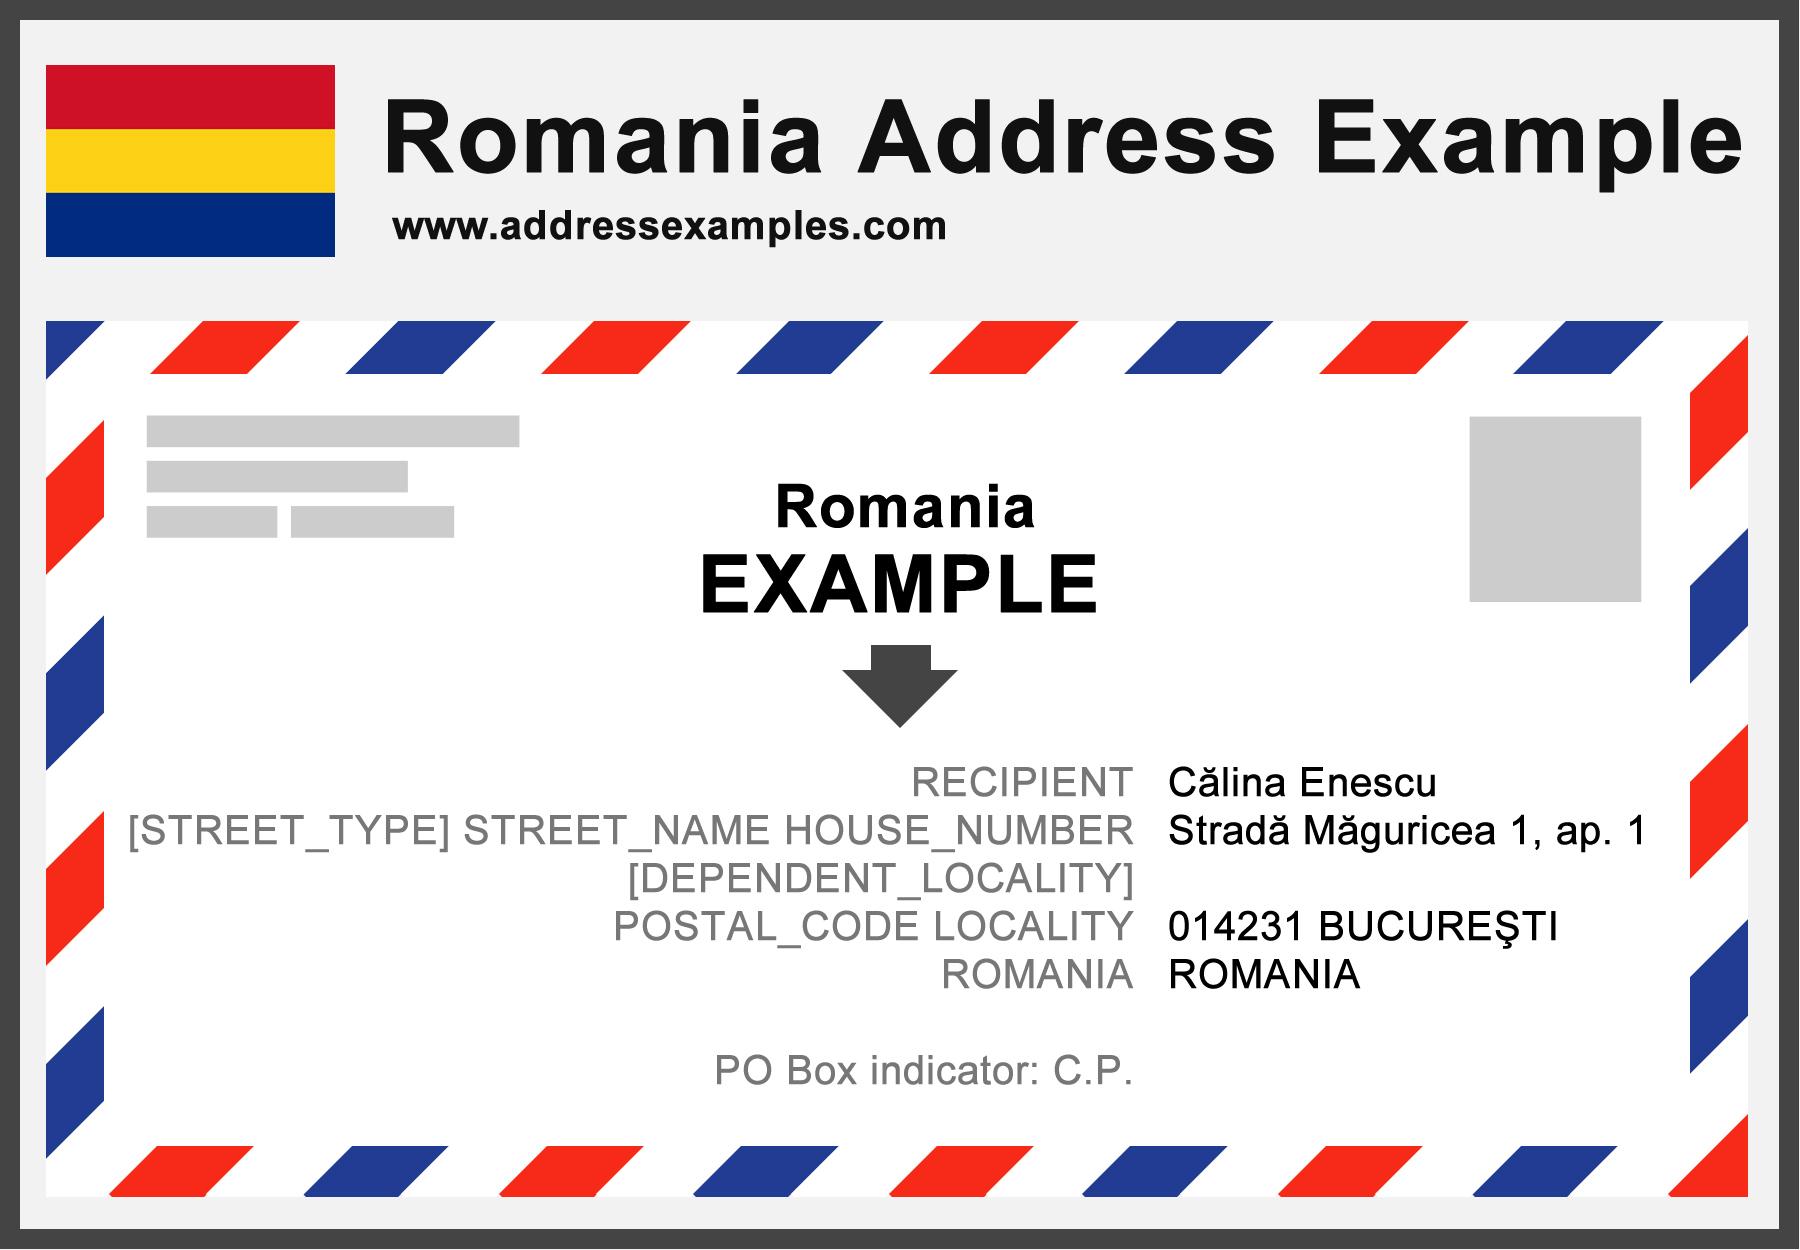 Romania Address Example